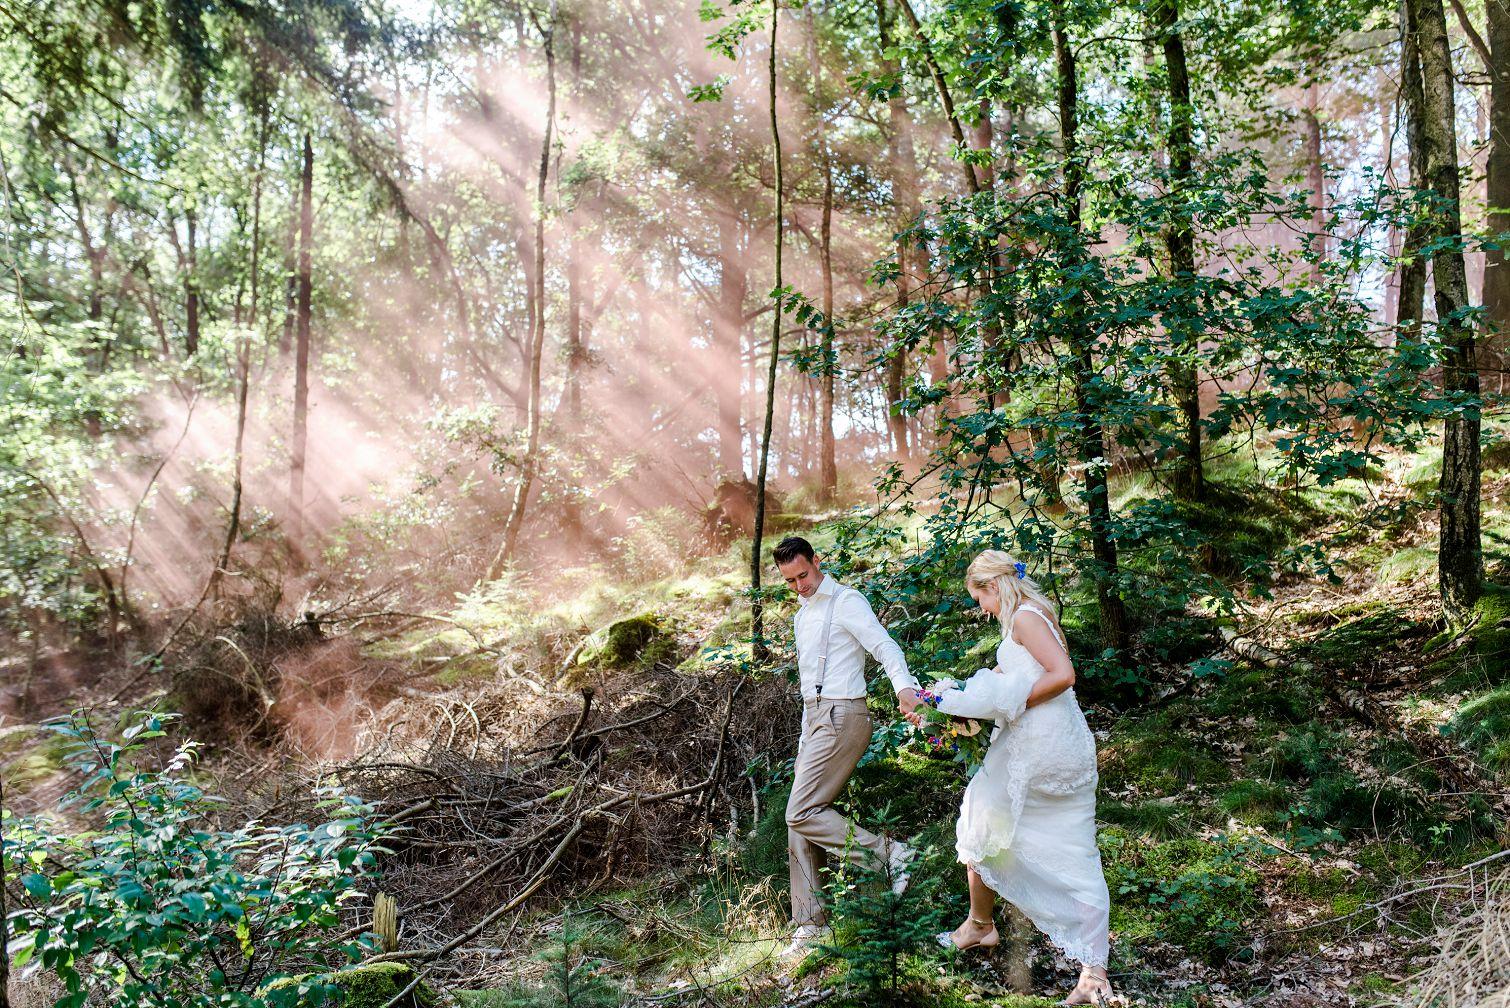 2-bruiloft-gasselte-de-kruimel-strand-standhuwelijk-bruidsboeket-veldboeket-aankleding-bloemist-taart-nakedcake-live-painter